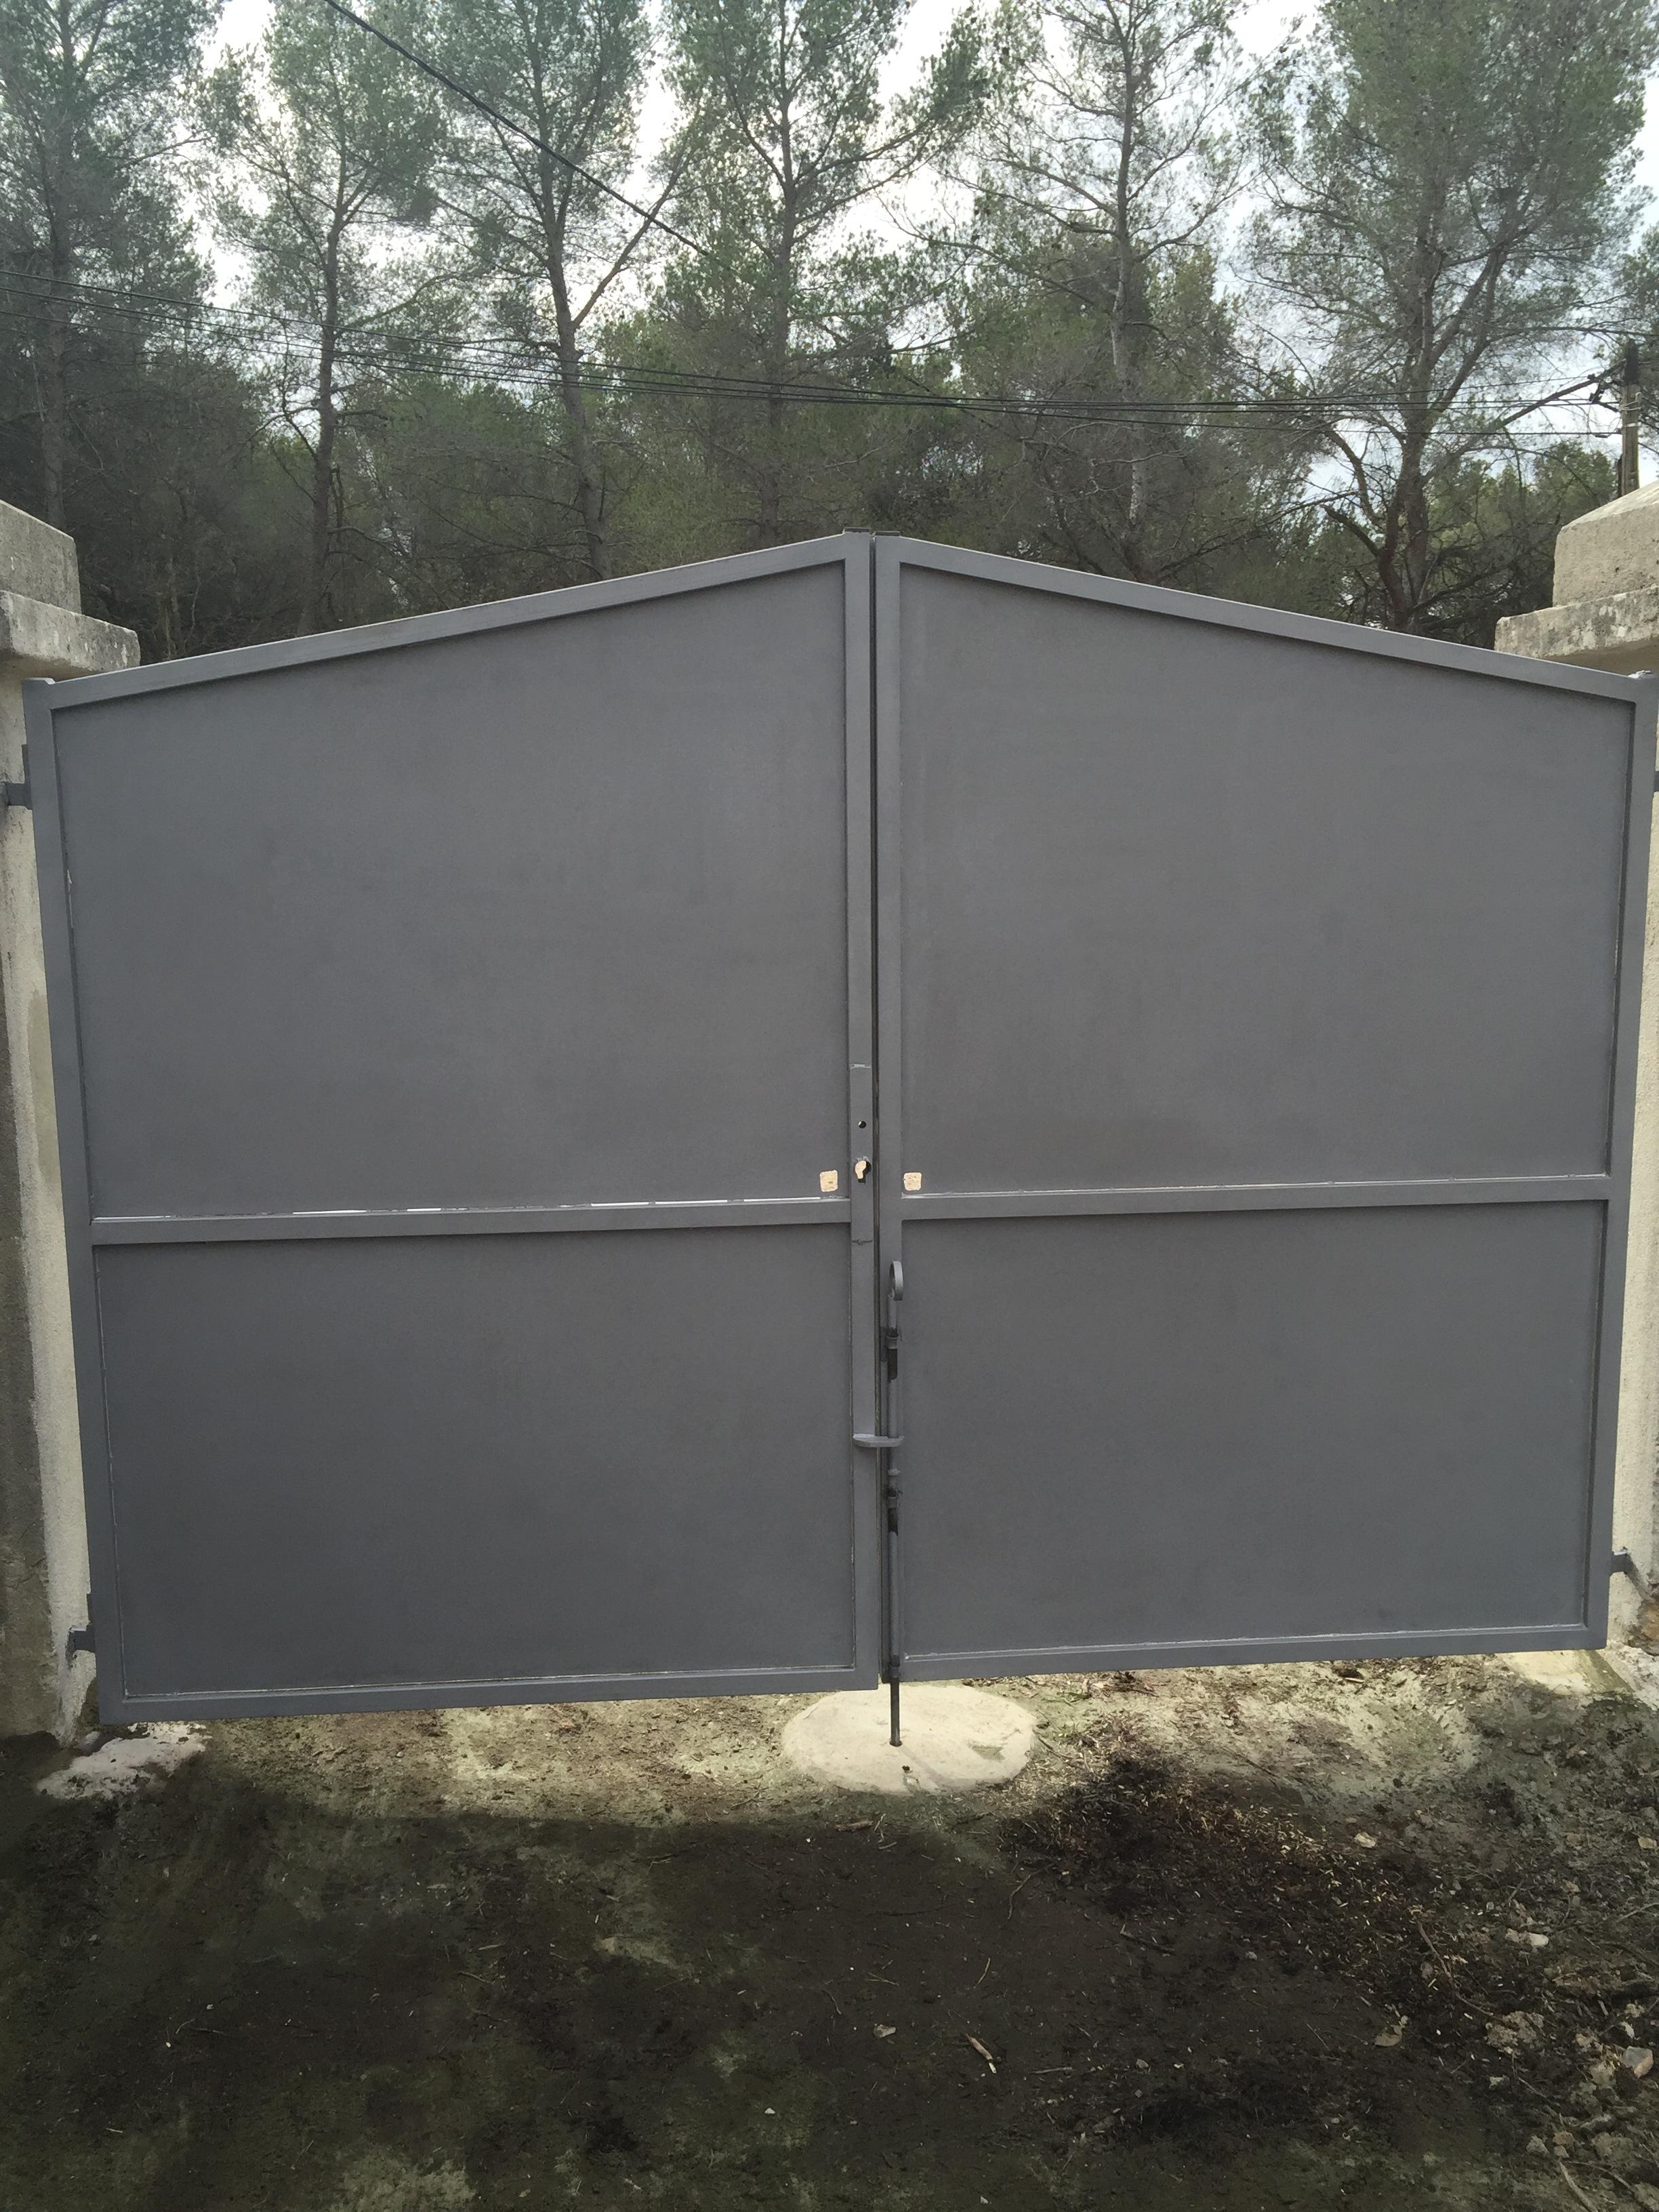 peindre portail fer excellent free peinture portail fer avec comment repeindre un portail en. Black Bedroom Furniture Sets. Home Design Ideas